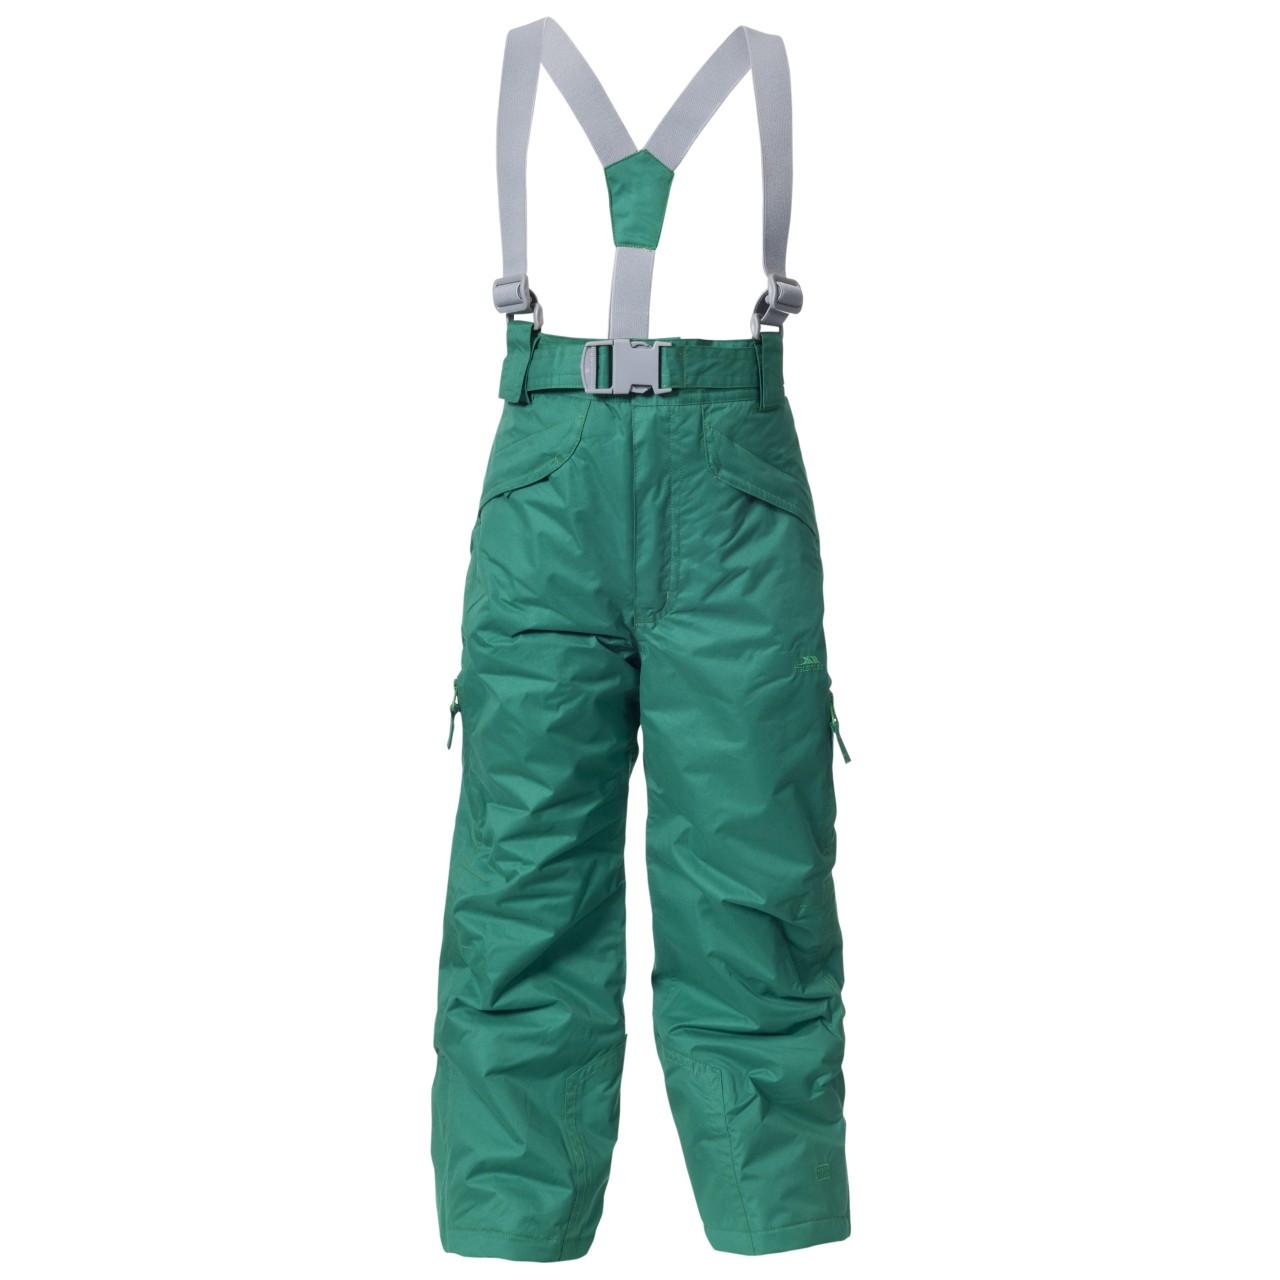 9aa9b095e Trespass Chlapčenské lyžiarske nohavice Marvelous - zelené, 140 cm ...